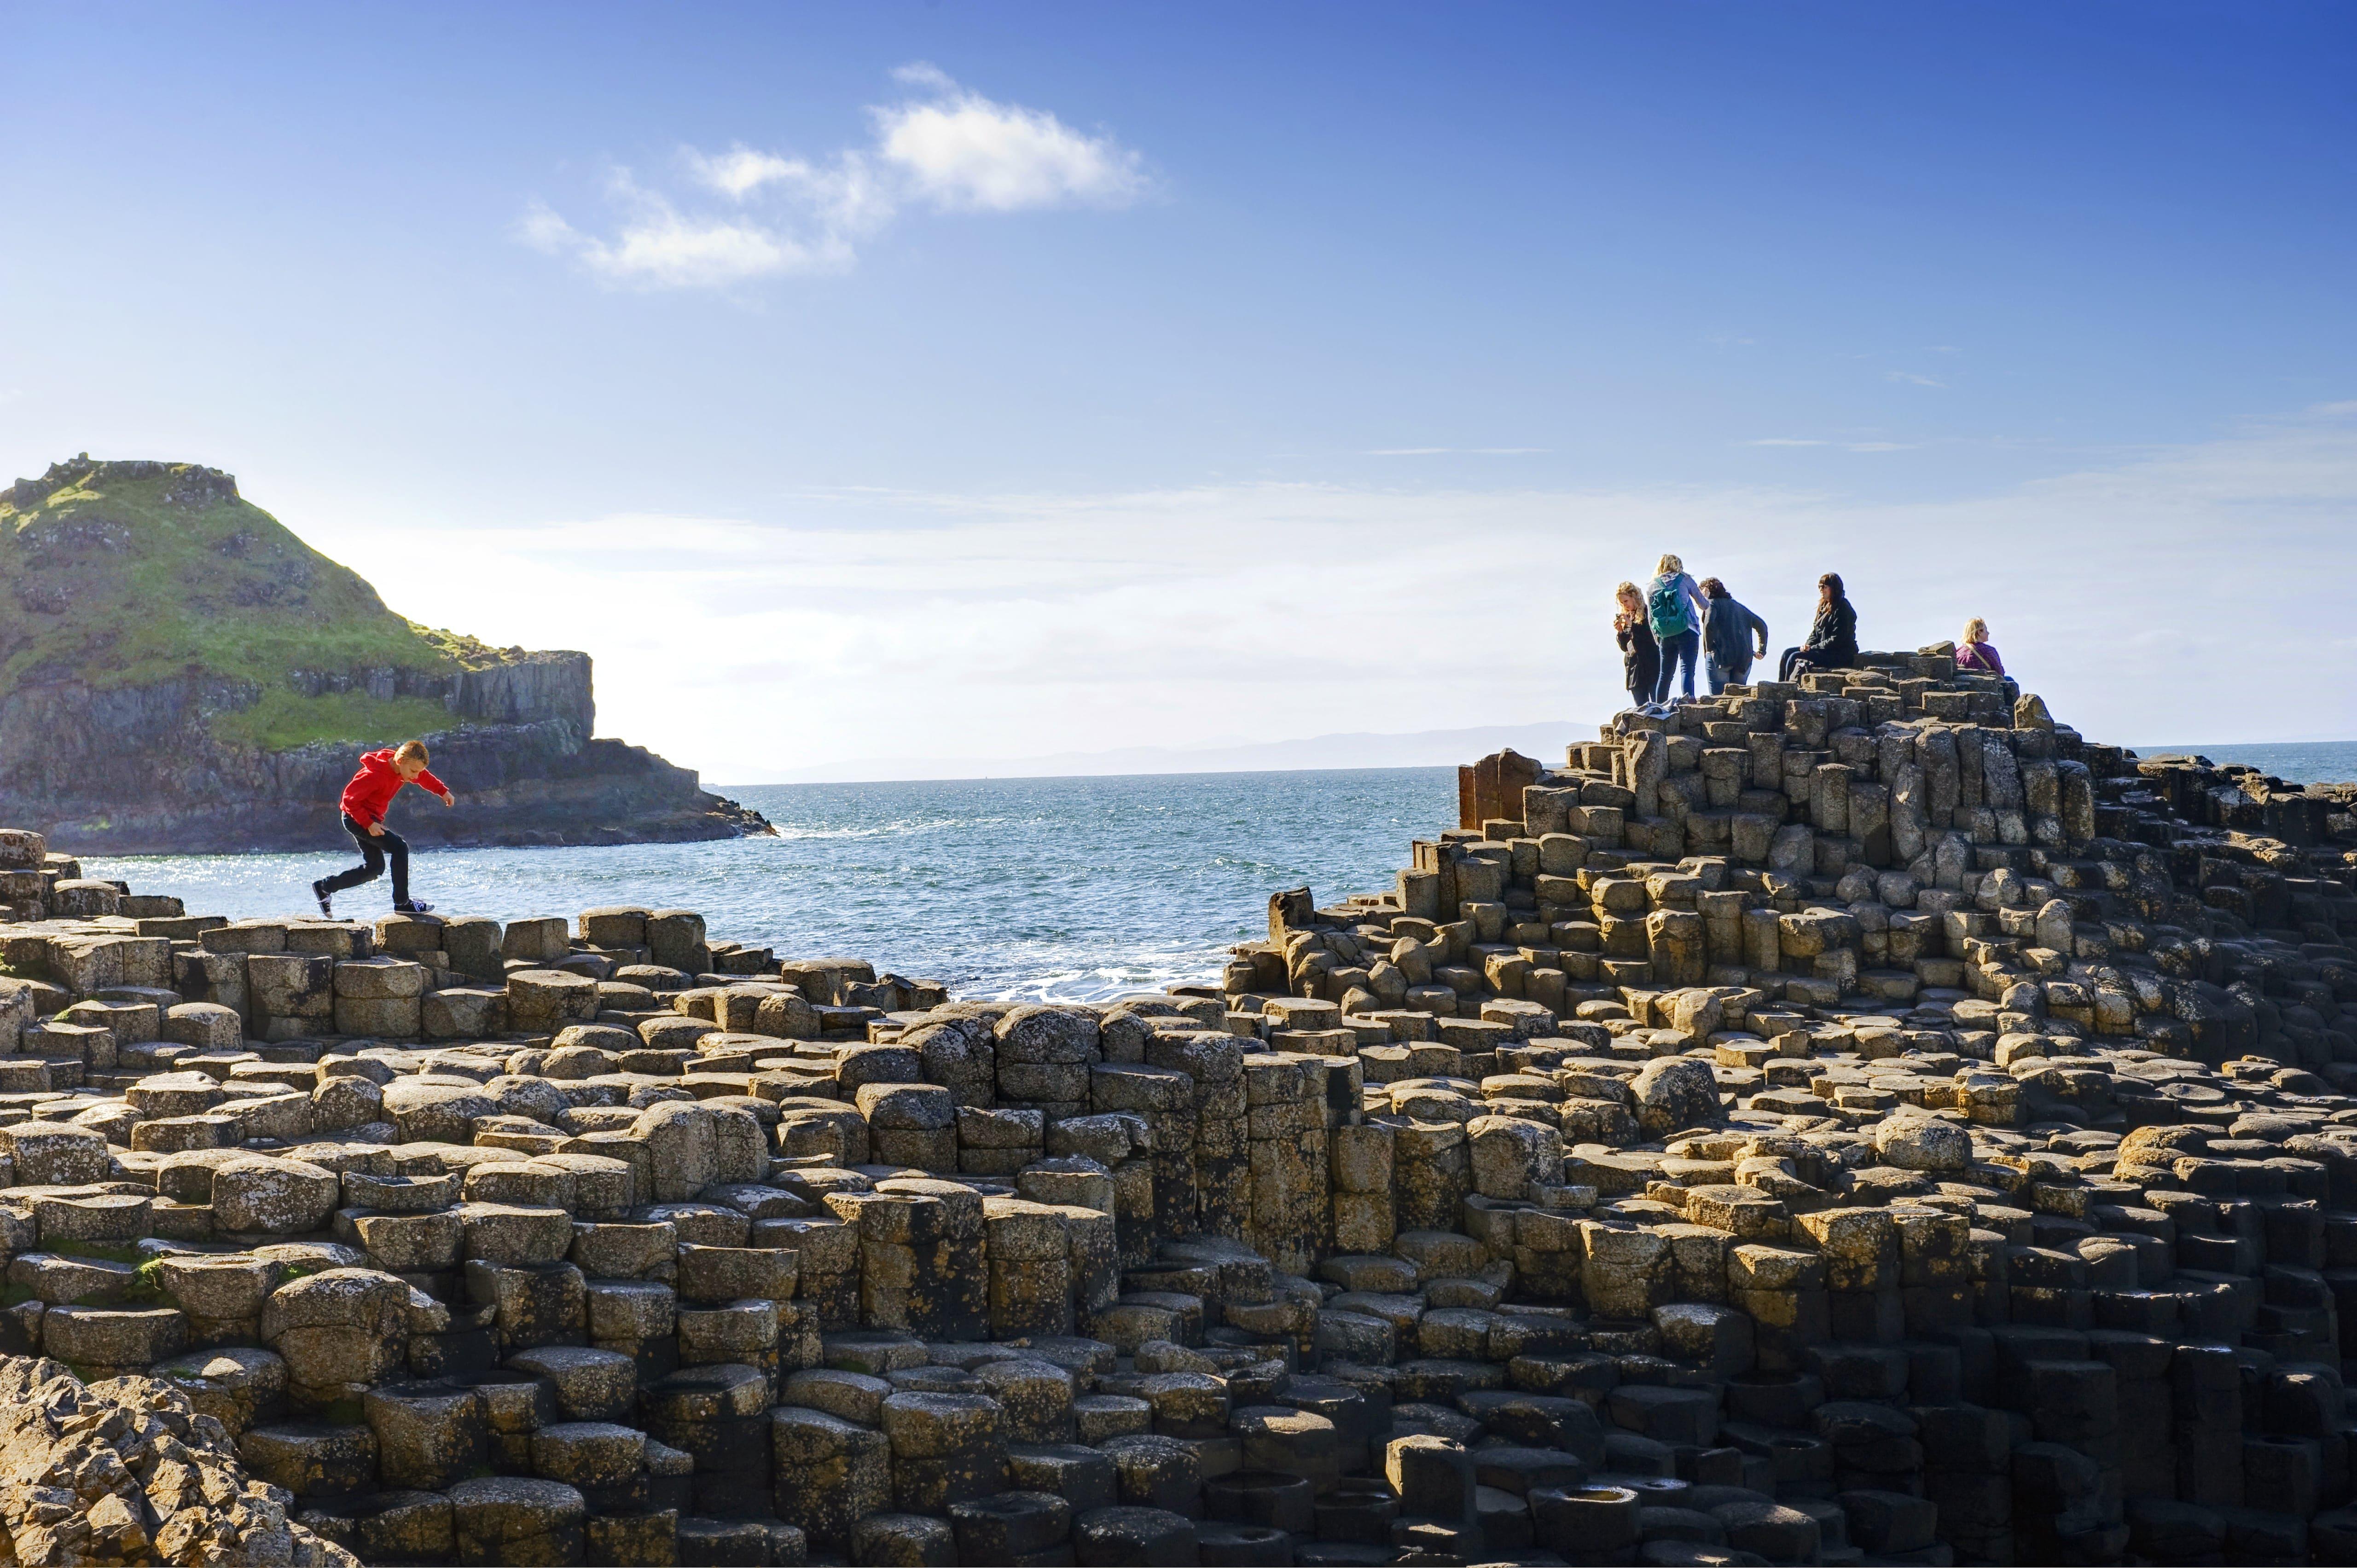 Causeway Coastal Route, Echt Ierland